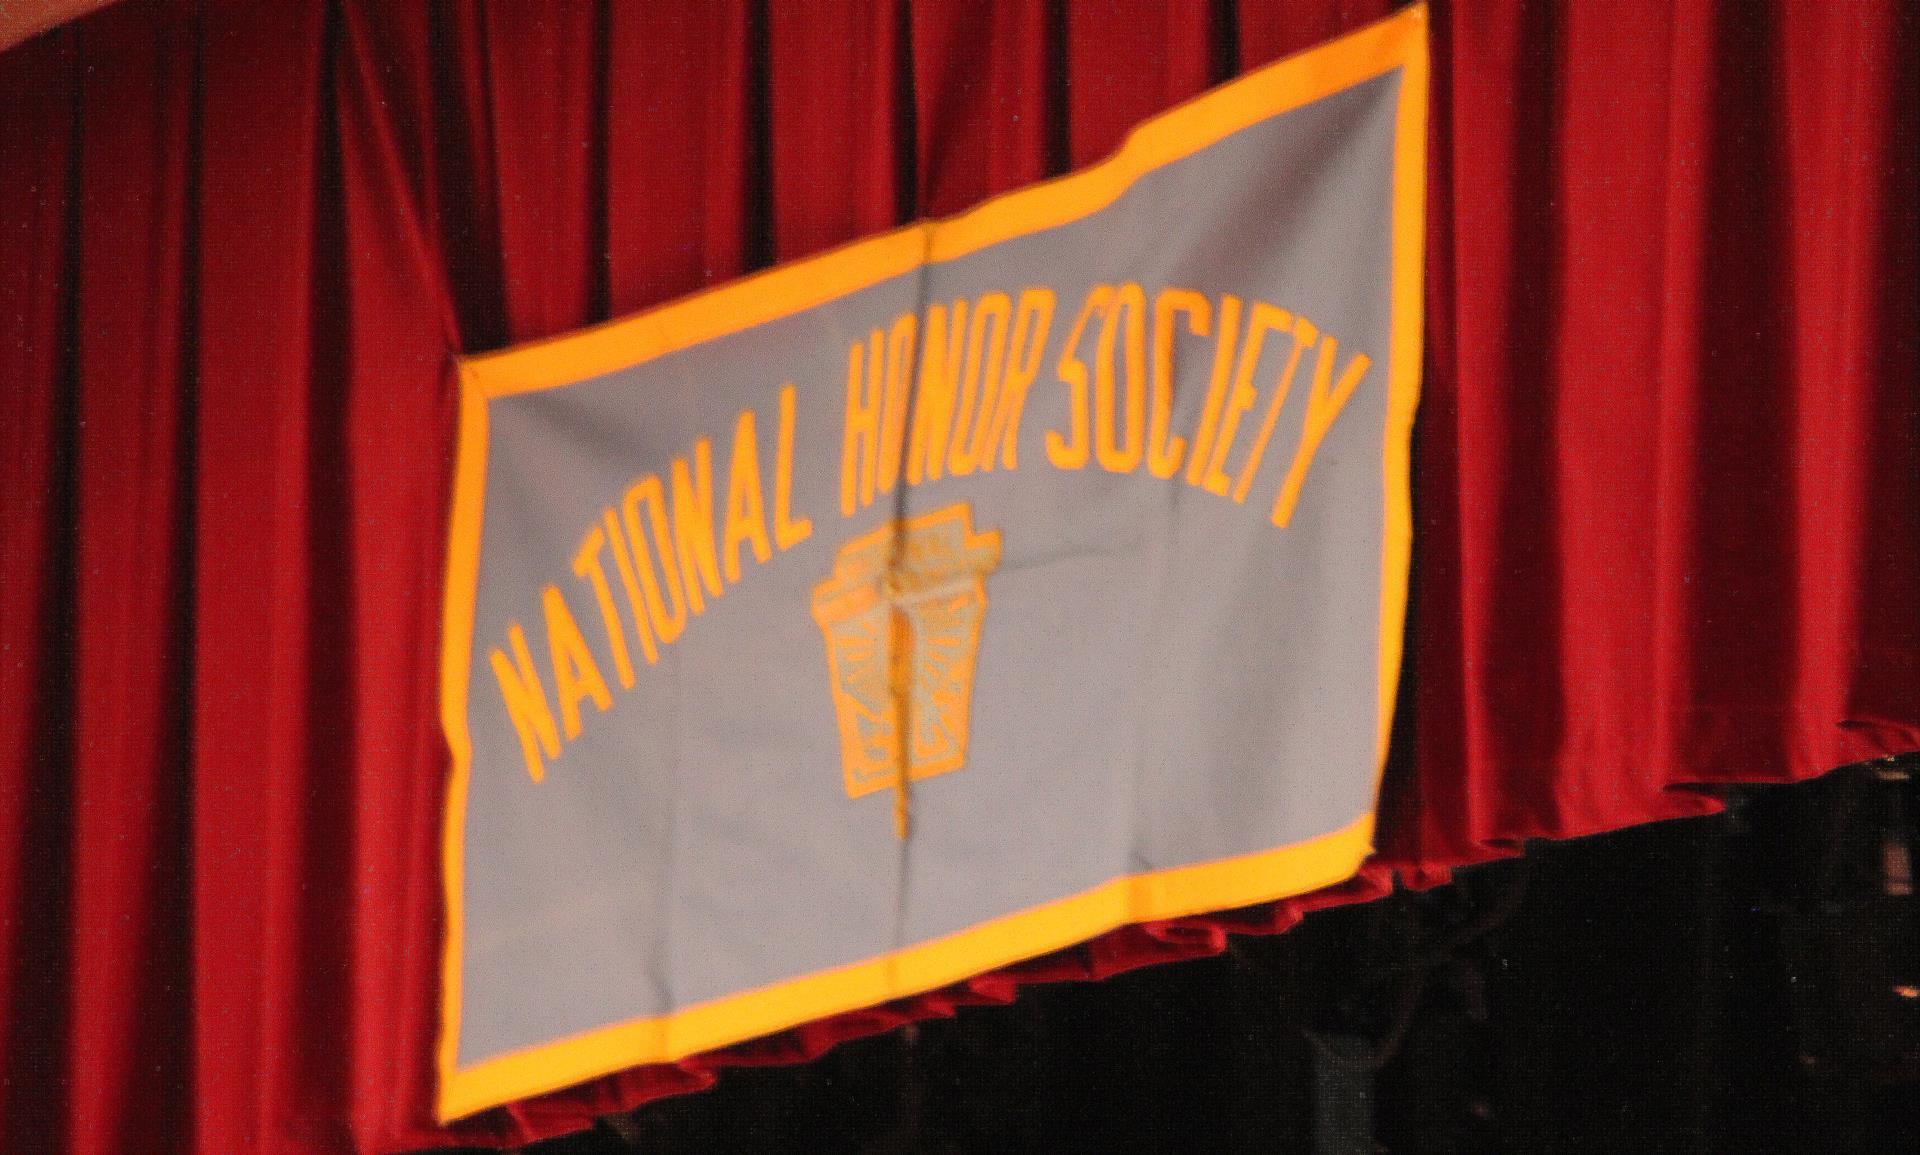 national honor society sign